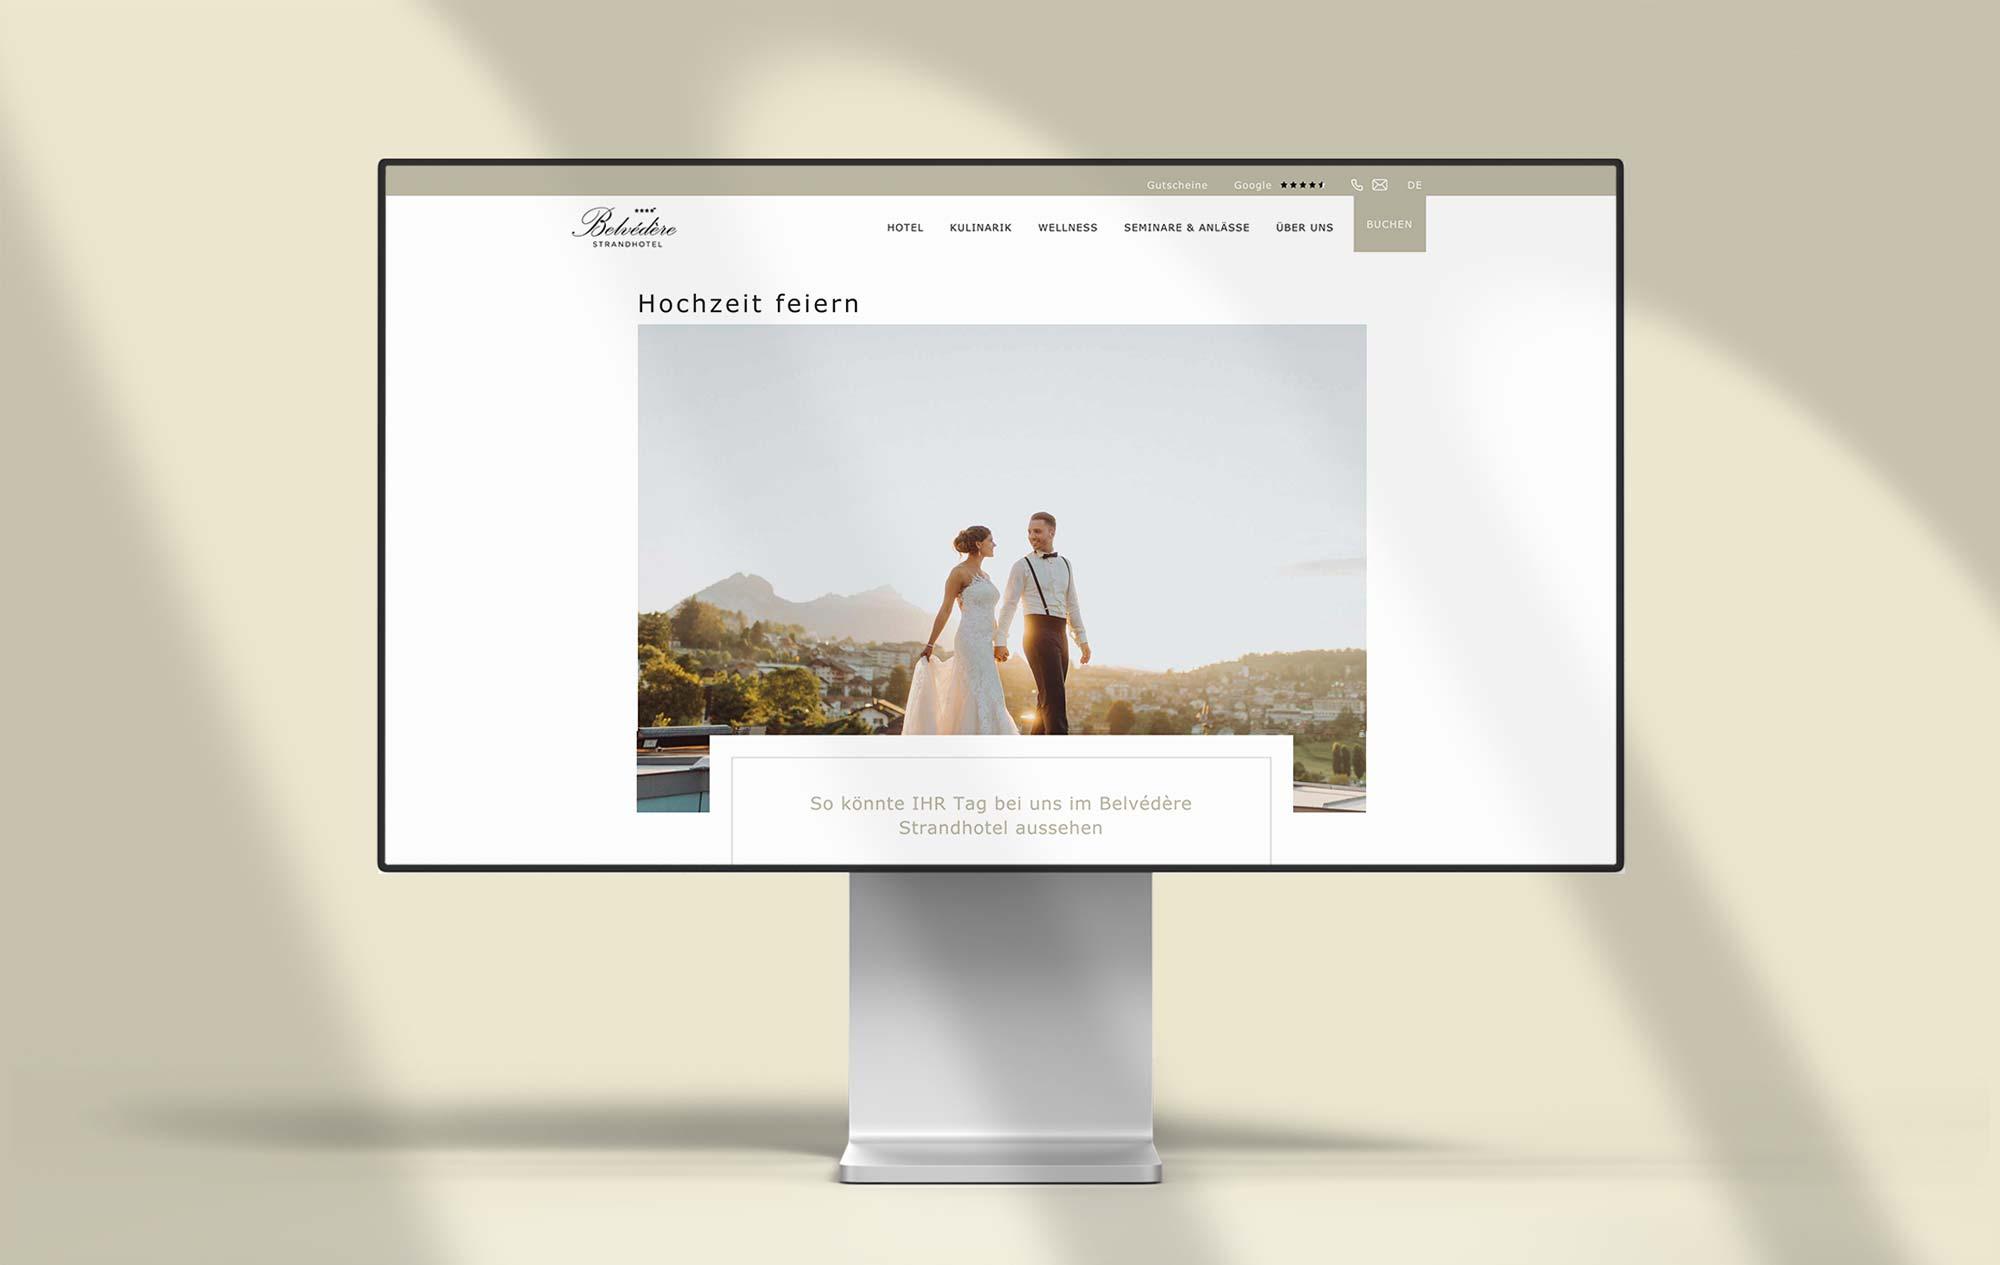 Design weddings celebrate - Development website for hotel Switzerland